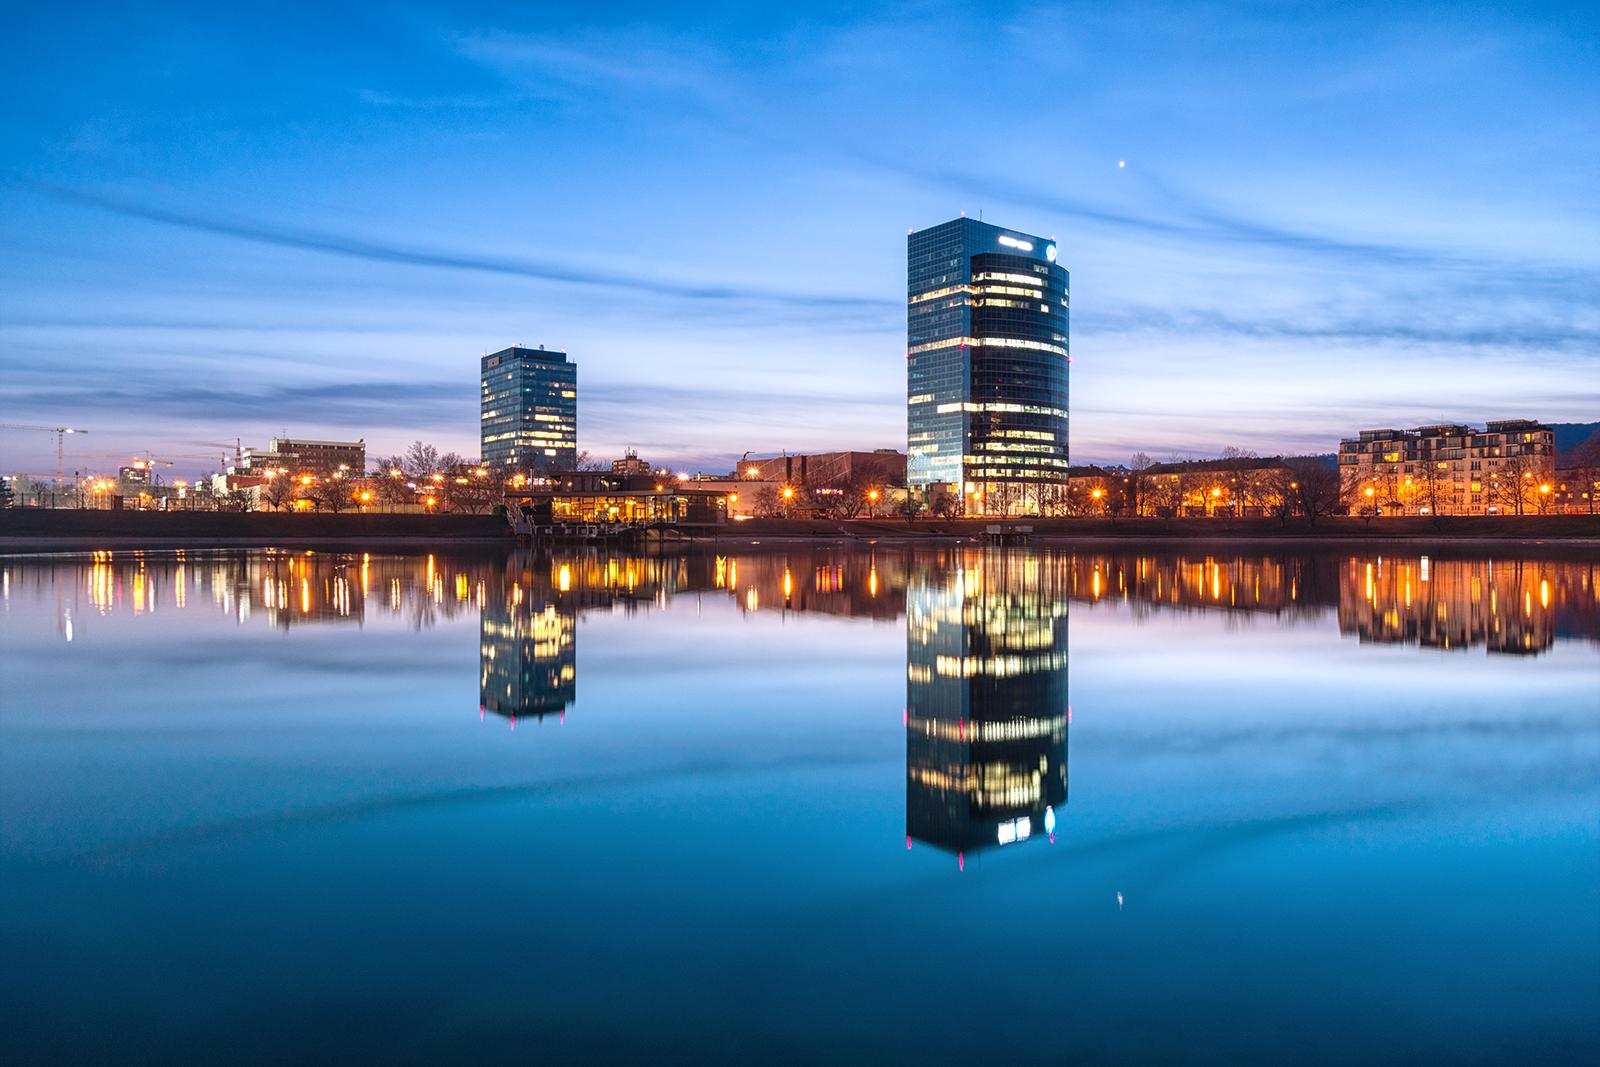 IBM, Polus, Kuchajda, HDR, slovakia, bratislava, sunset, buildings, lake, water, sky